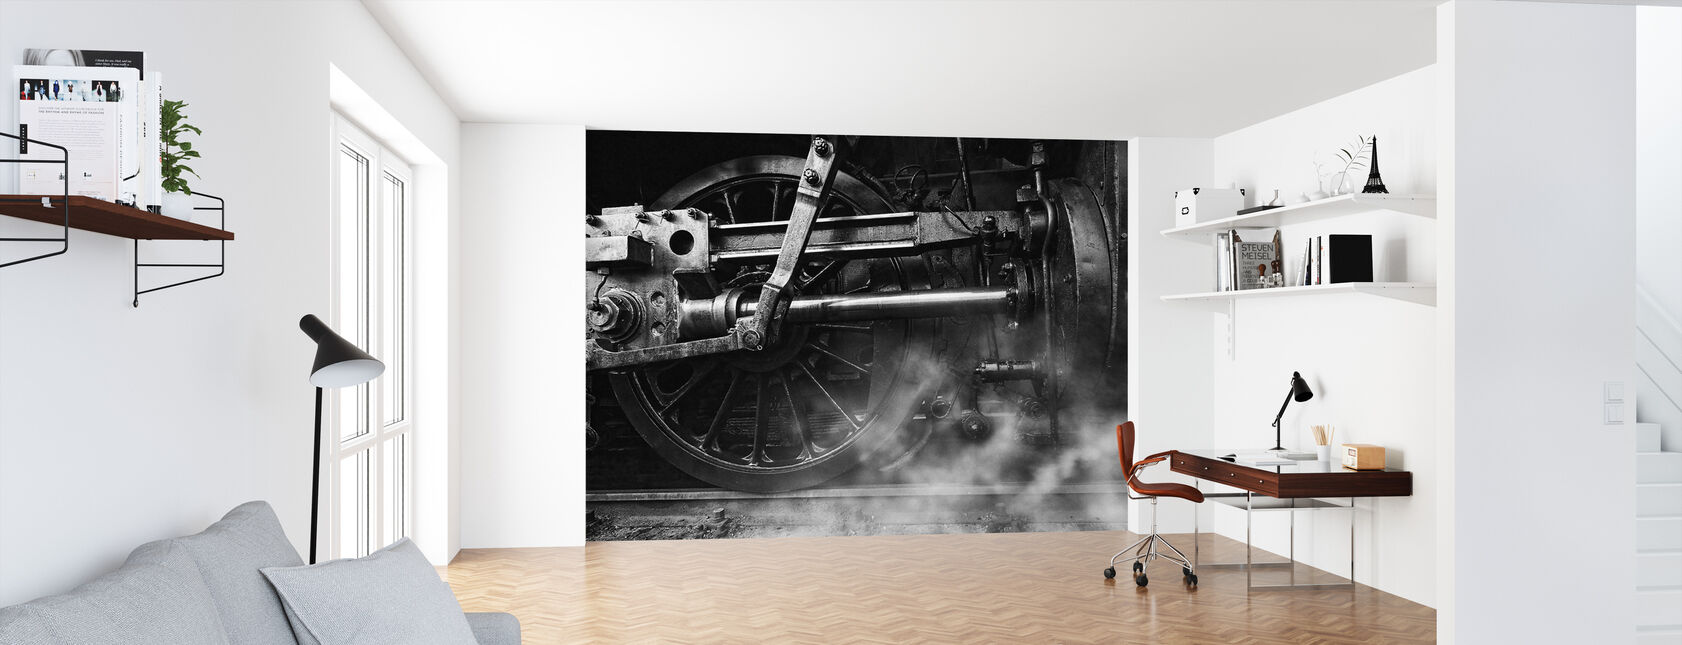 Locomotive Breath - Wallpaper - Office